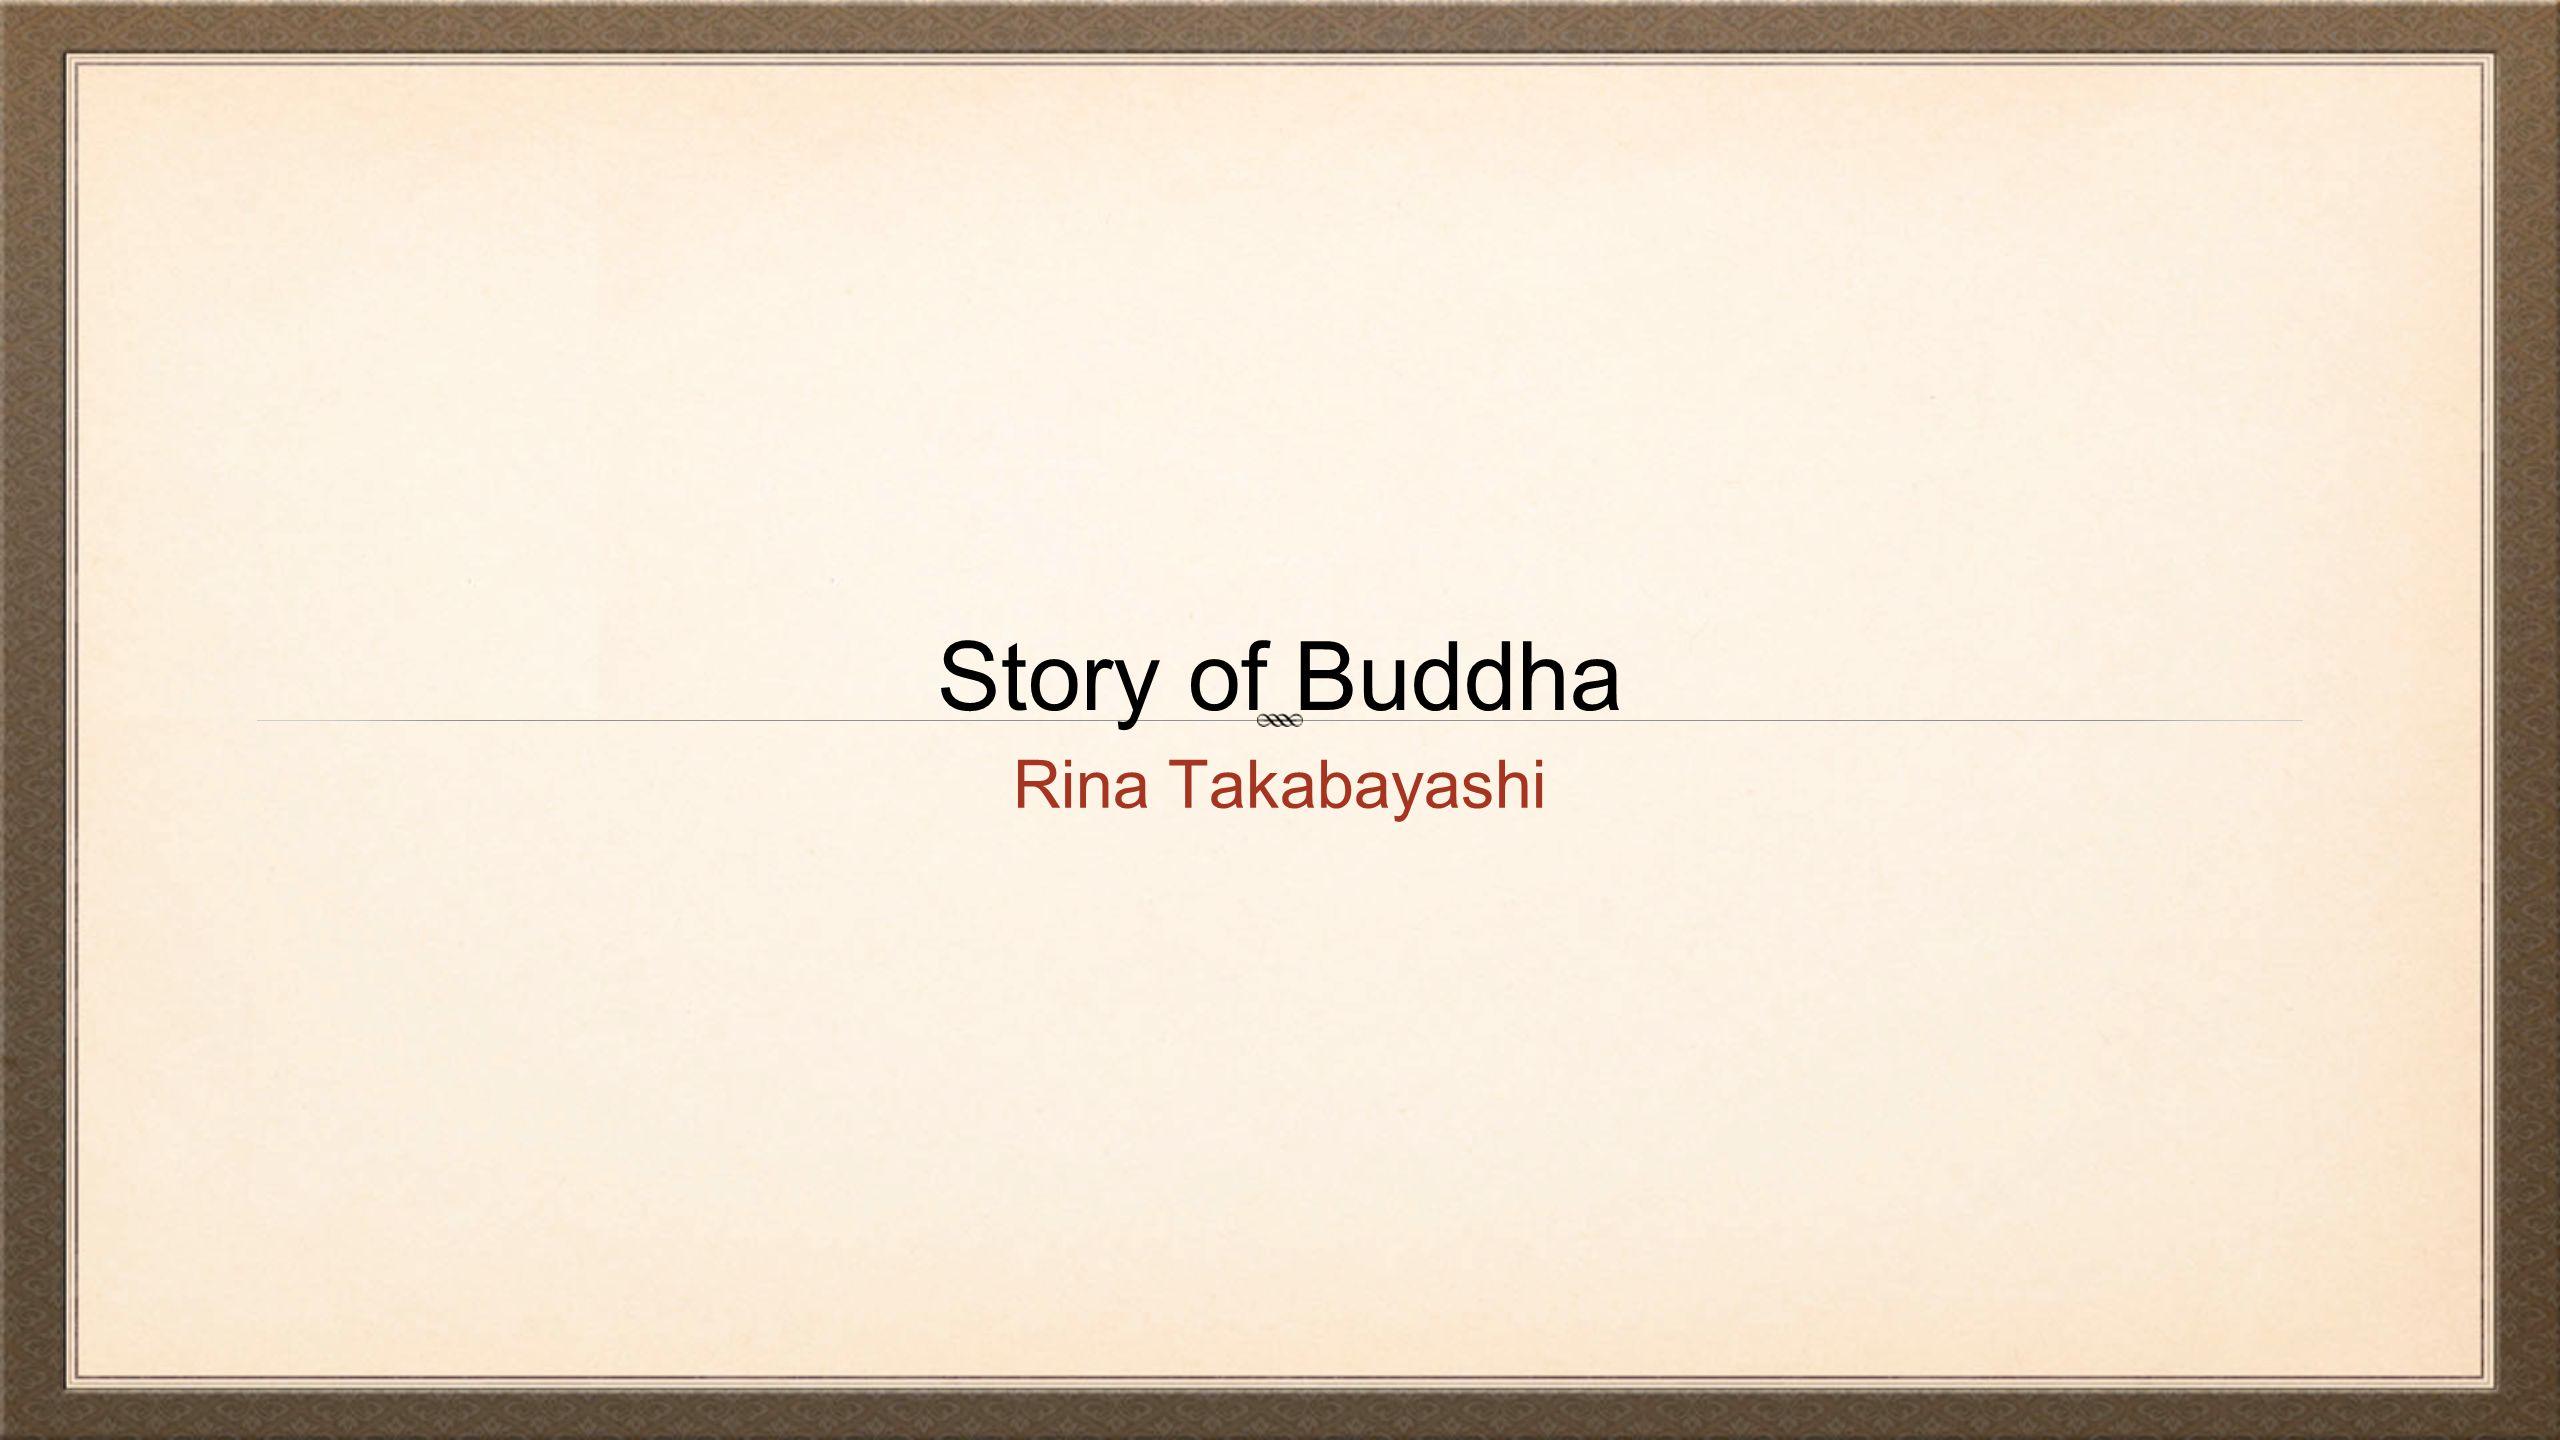 Story of Buddha Rina Takabayashi